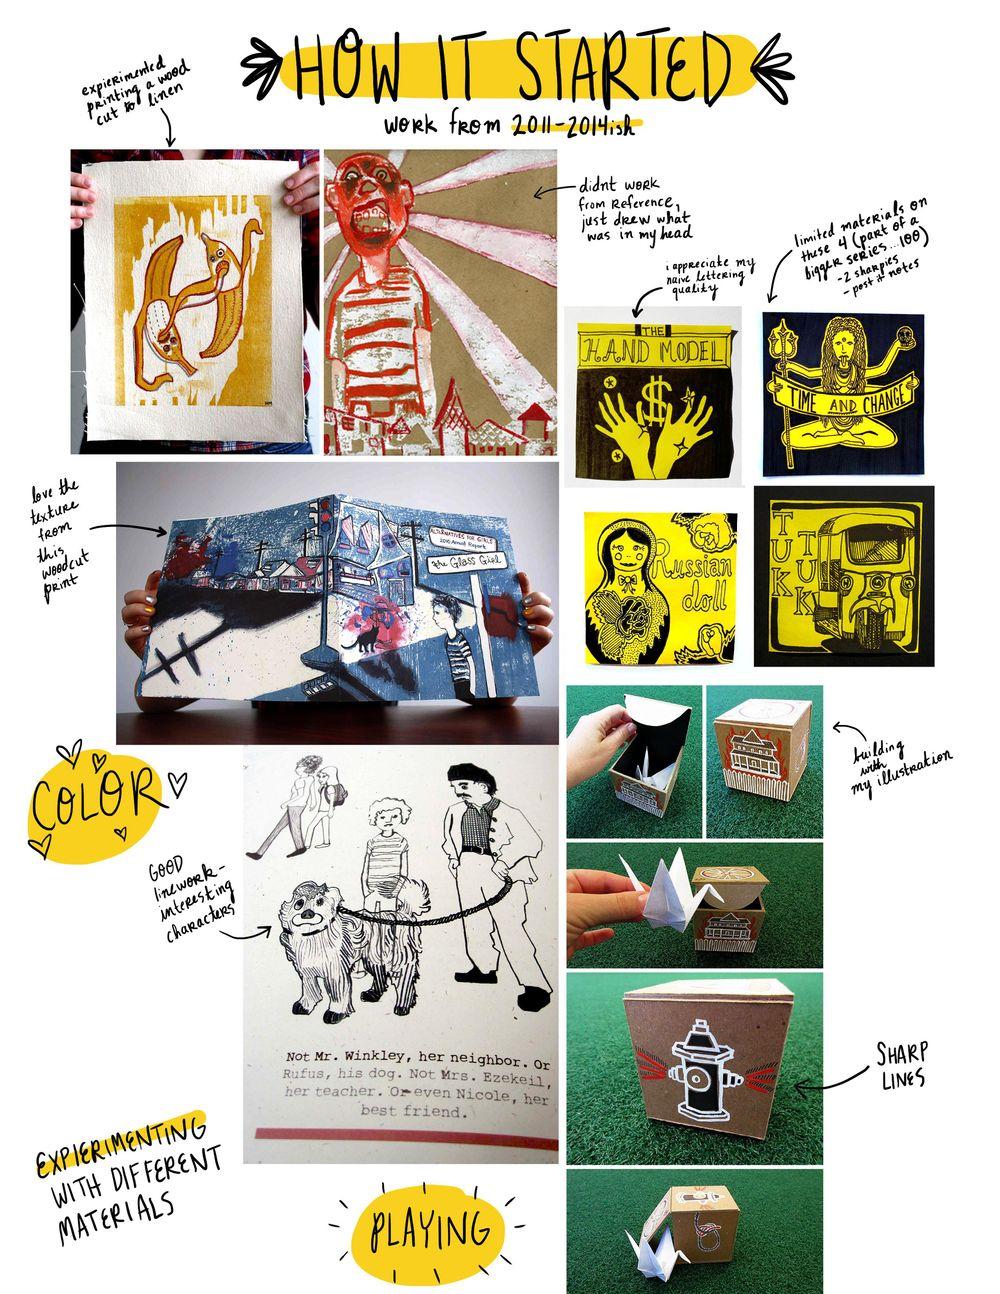 Pilot Illustrations - image 4 - student project